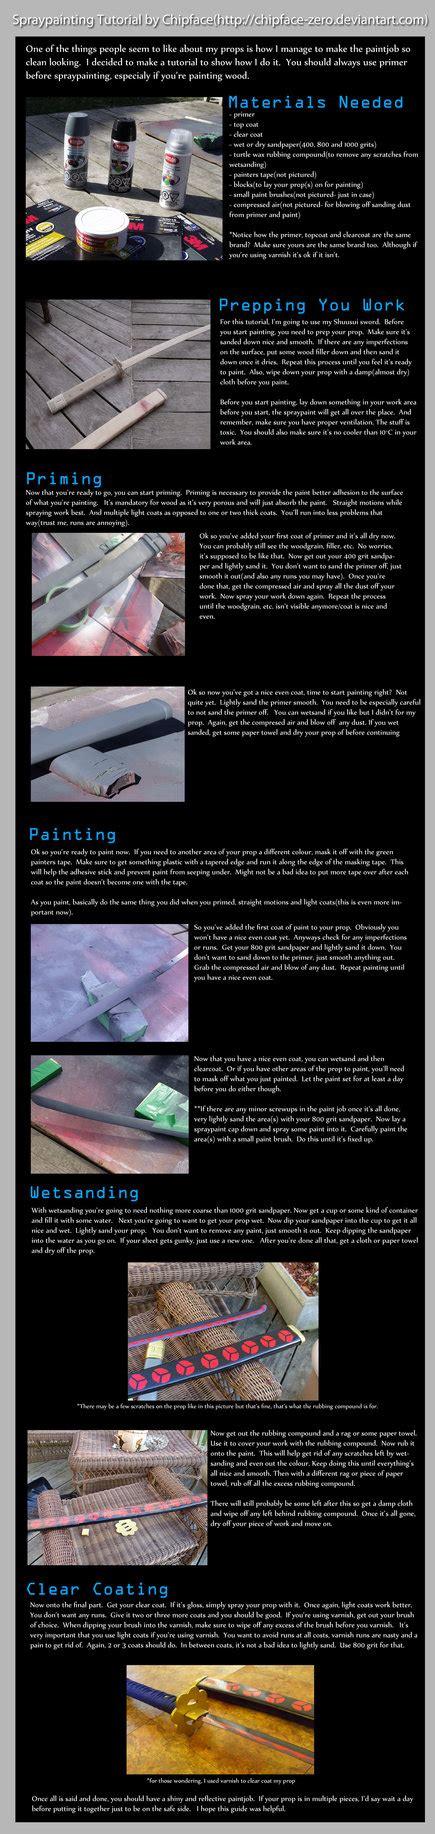 spray painting tutorial spraypainting tutorial by chipface zero on deviantart